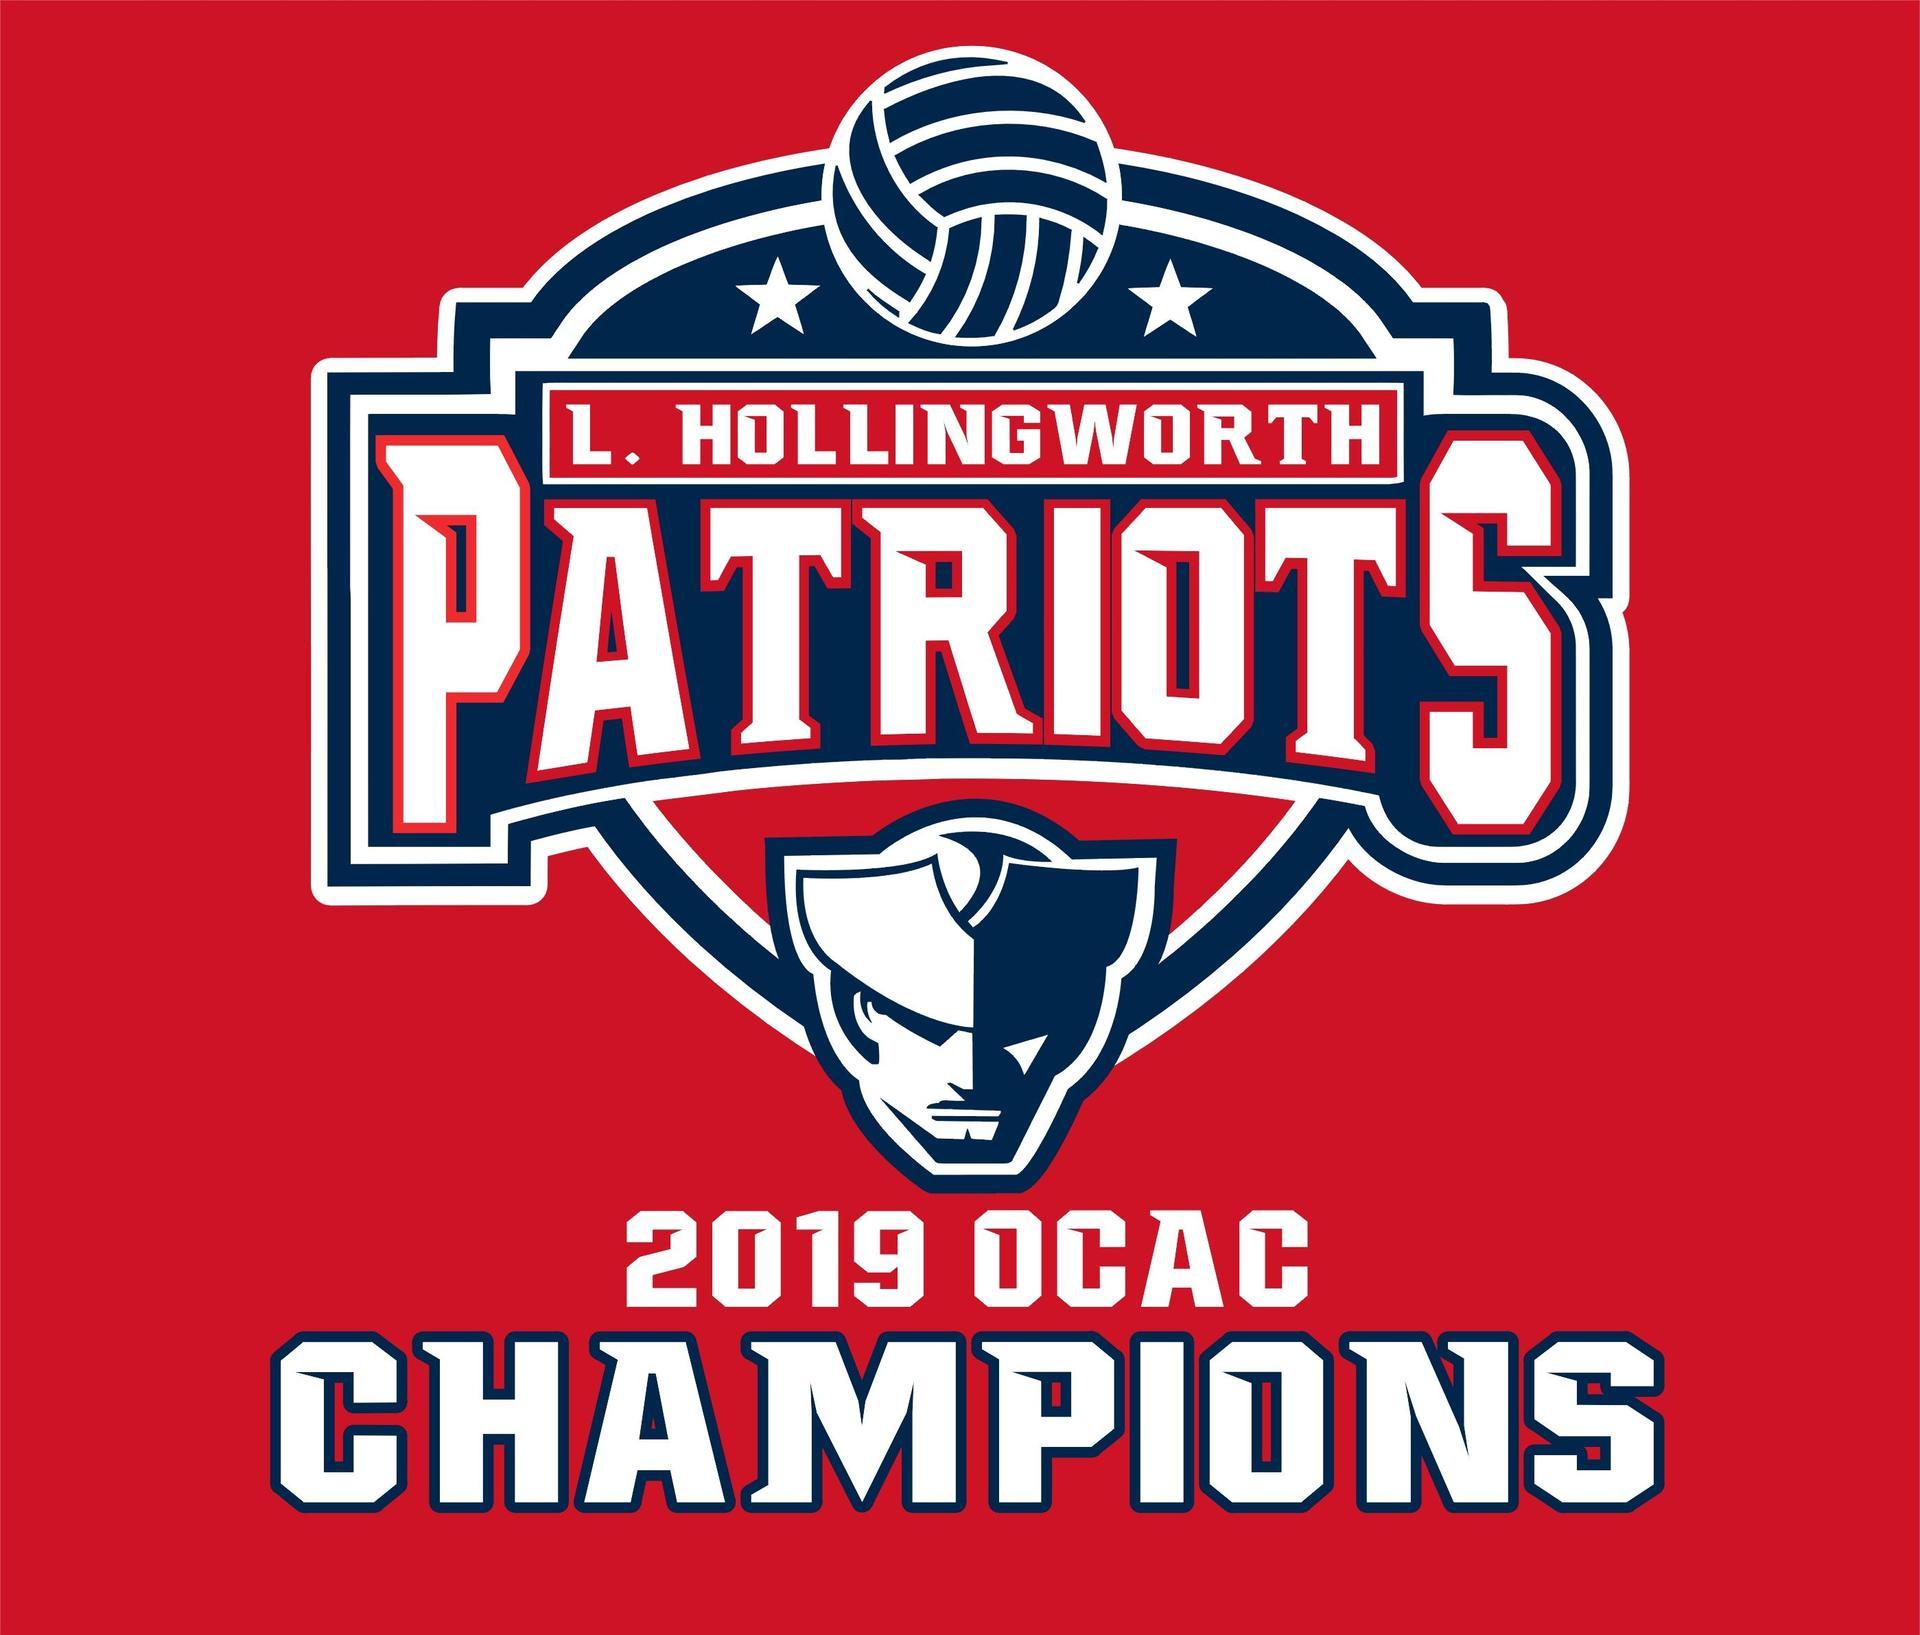 2019 LHS Patriots Championship Logo